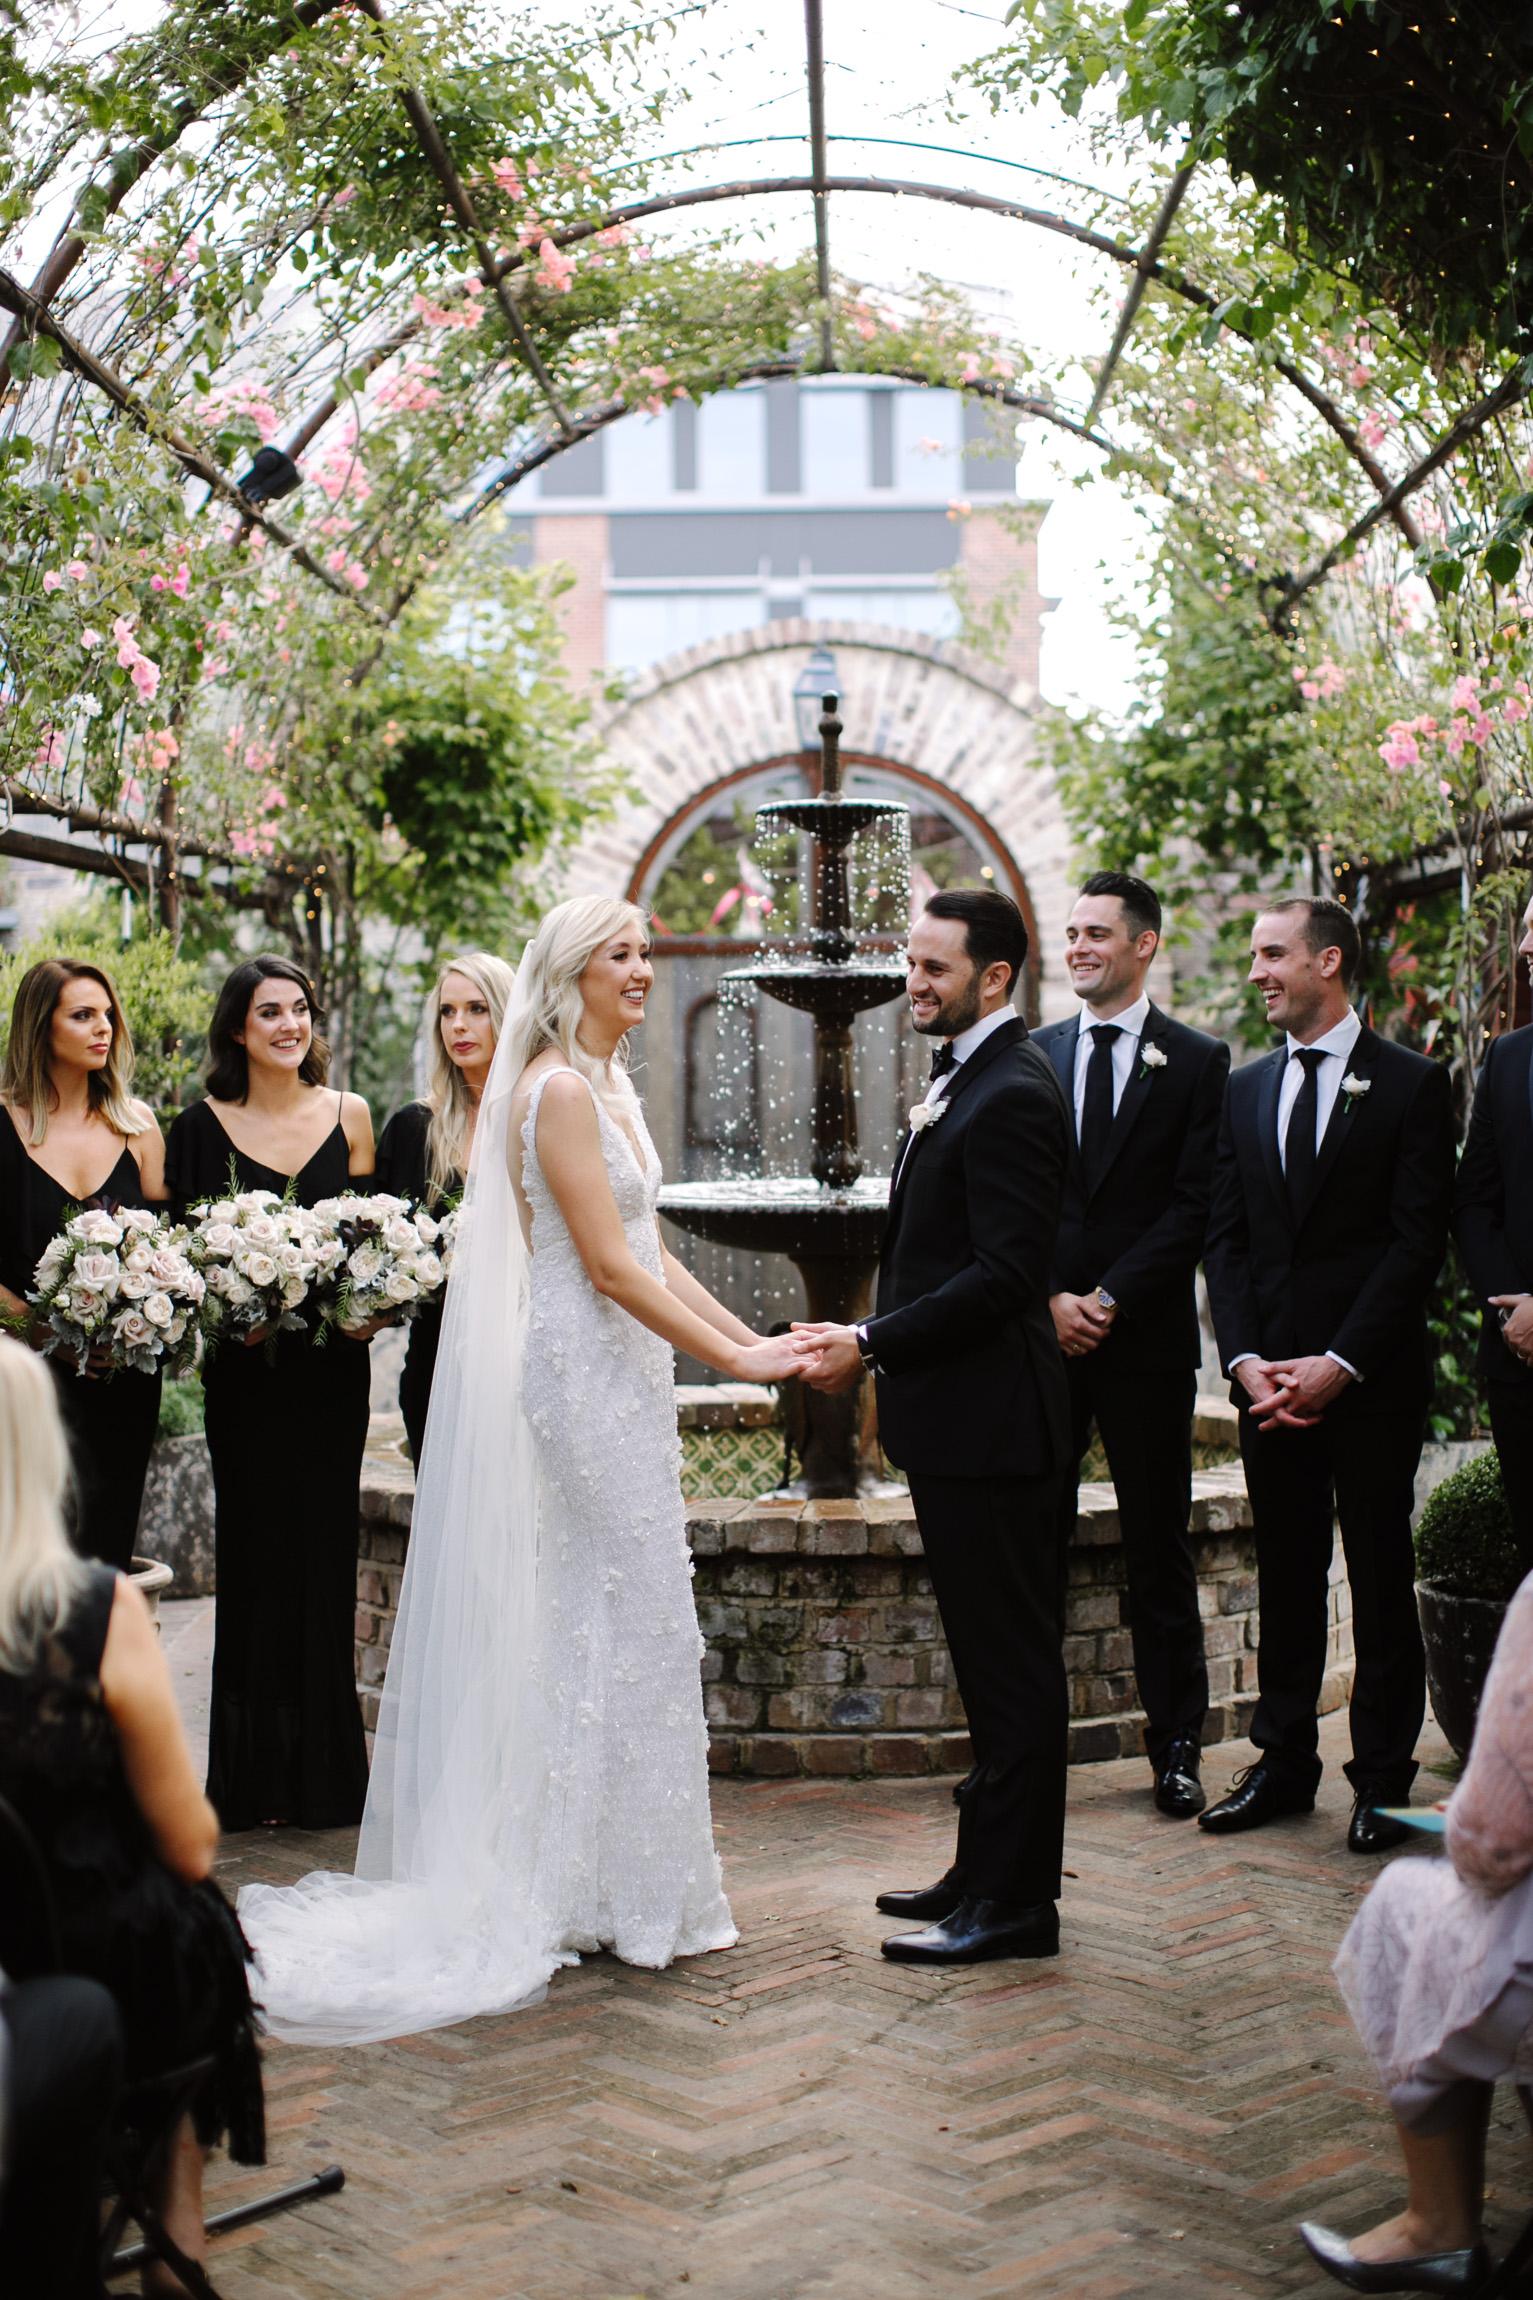 180223_justinaaron_wedding_charlotte_david_h-112.jpg